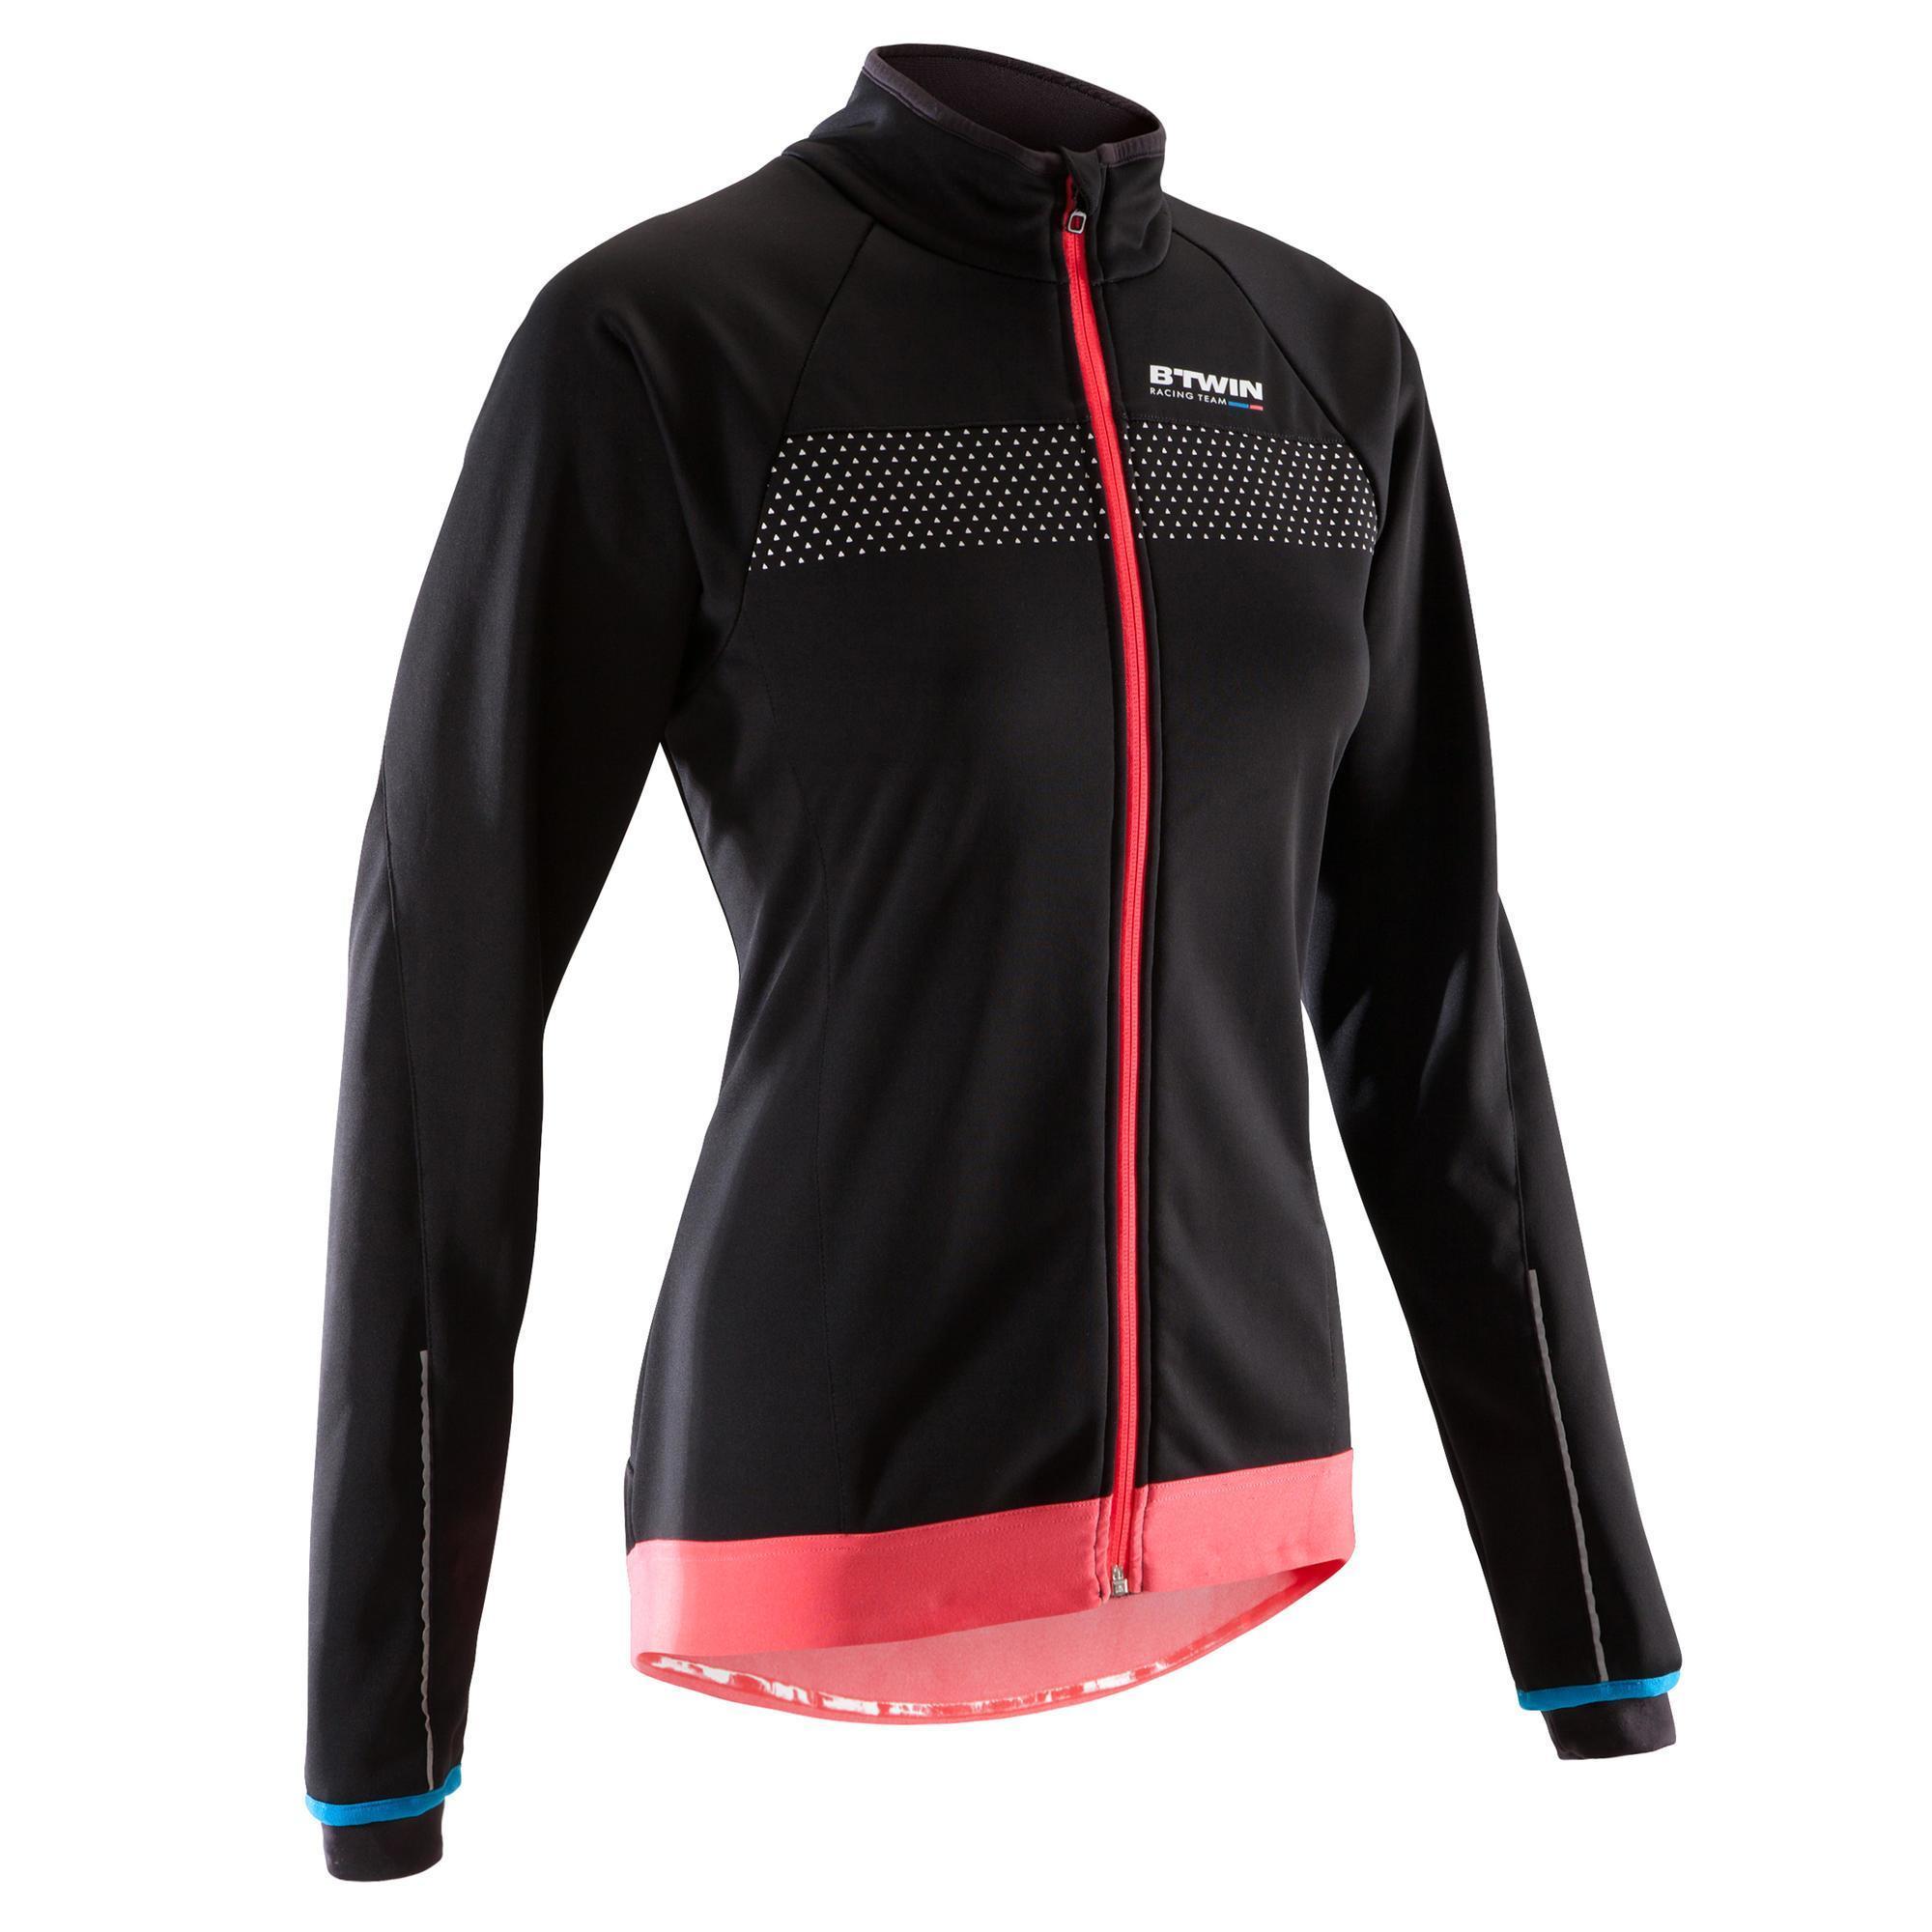 Fahrradjacke Rennrad 900 Damen schwarz | Sportbekleidung > Sportjacken > Fahrradjacken | Schwarz - Rot - Rosa | B´twin